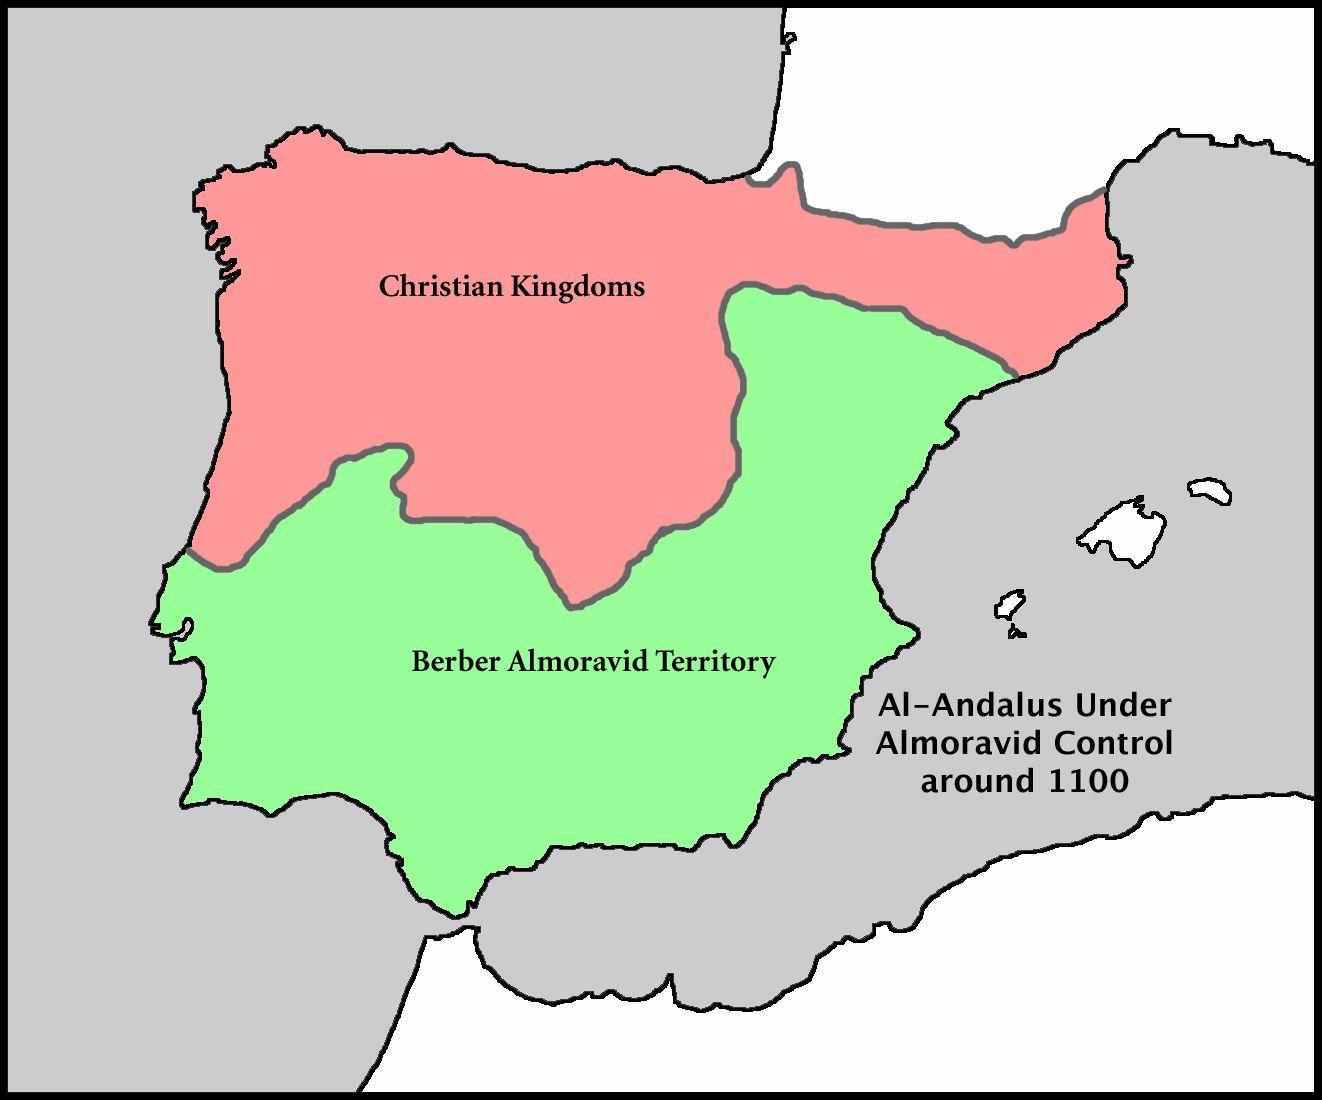 Map Of Spain To Color.Muslim Spain Map Autobedrijfmaatje